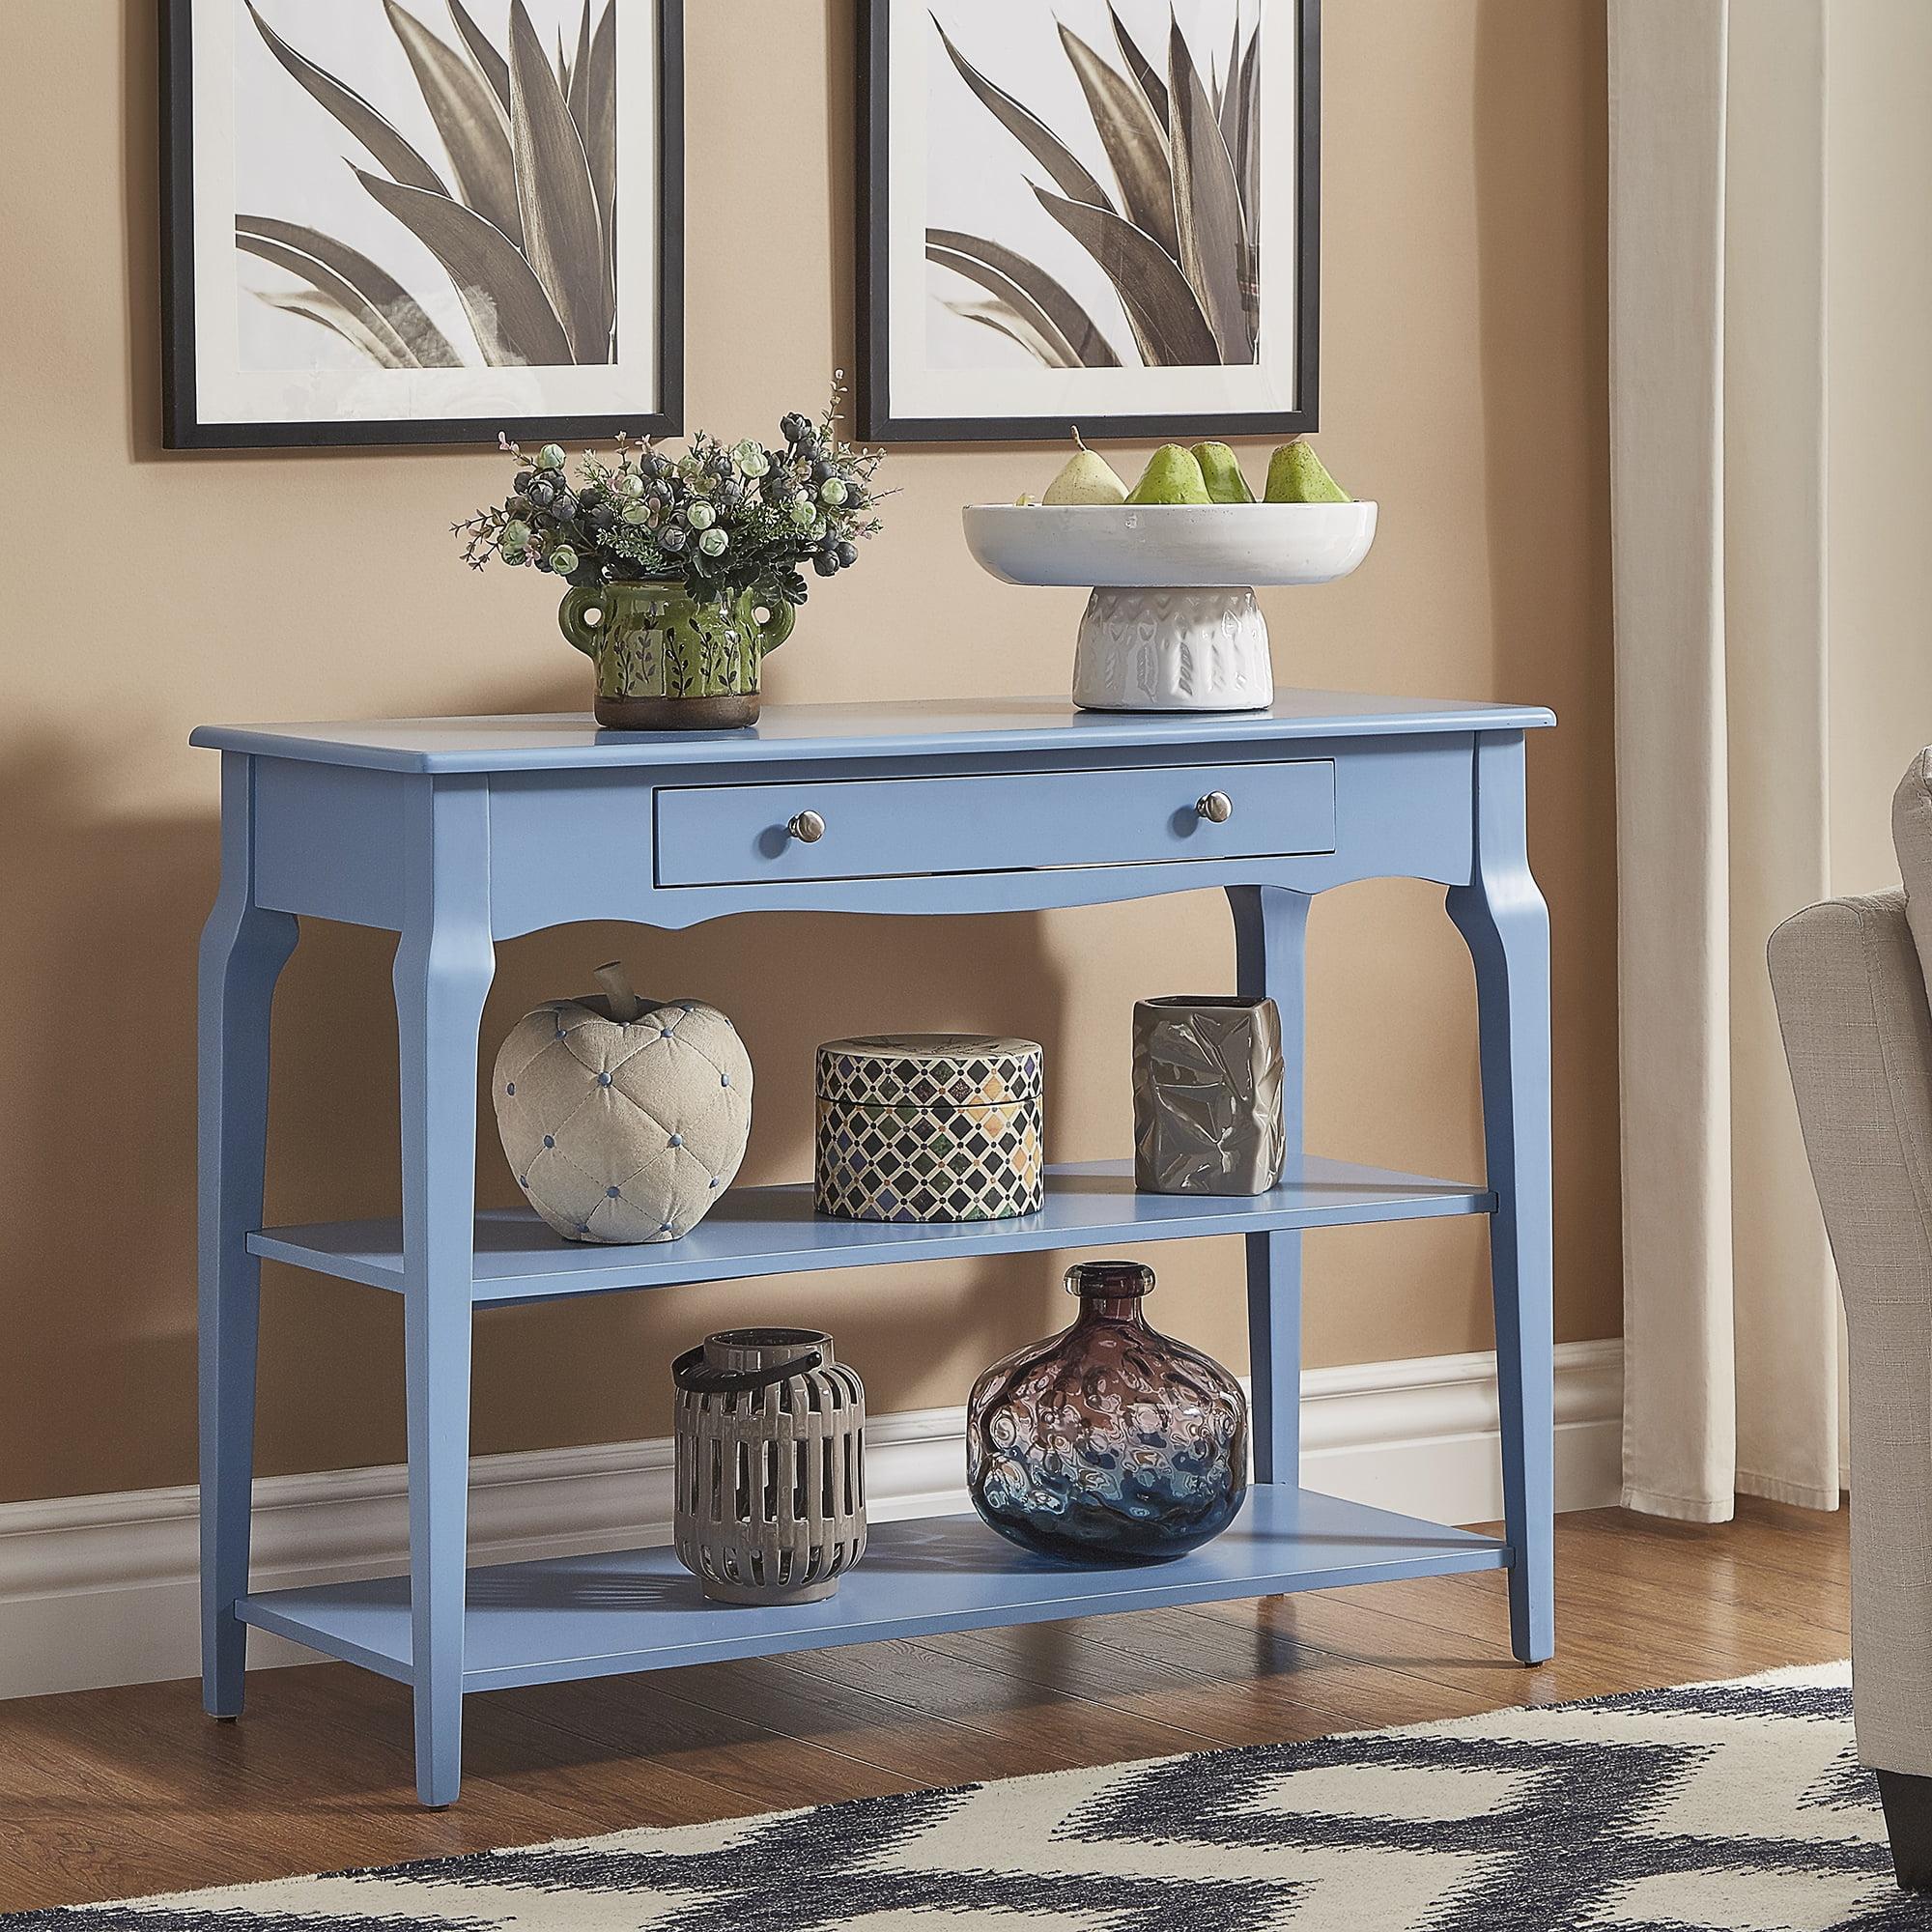 Chelsea Lane Riley Sofa Table by Weston Home